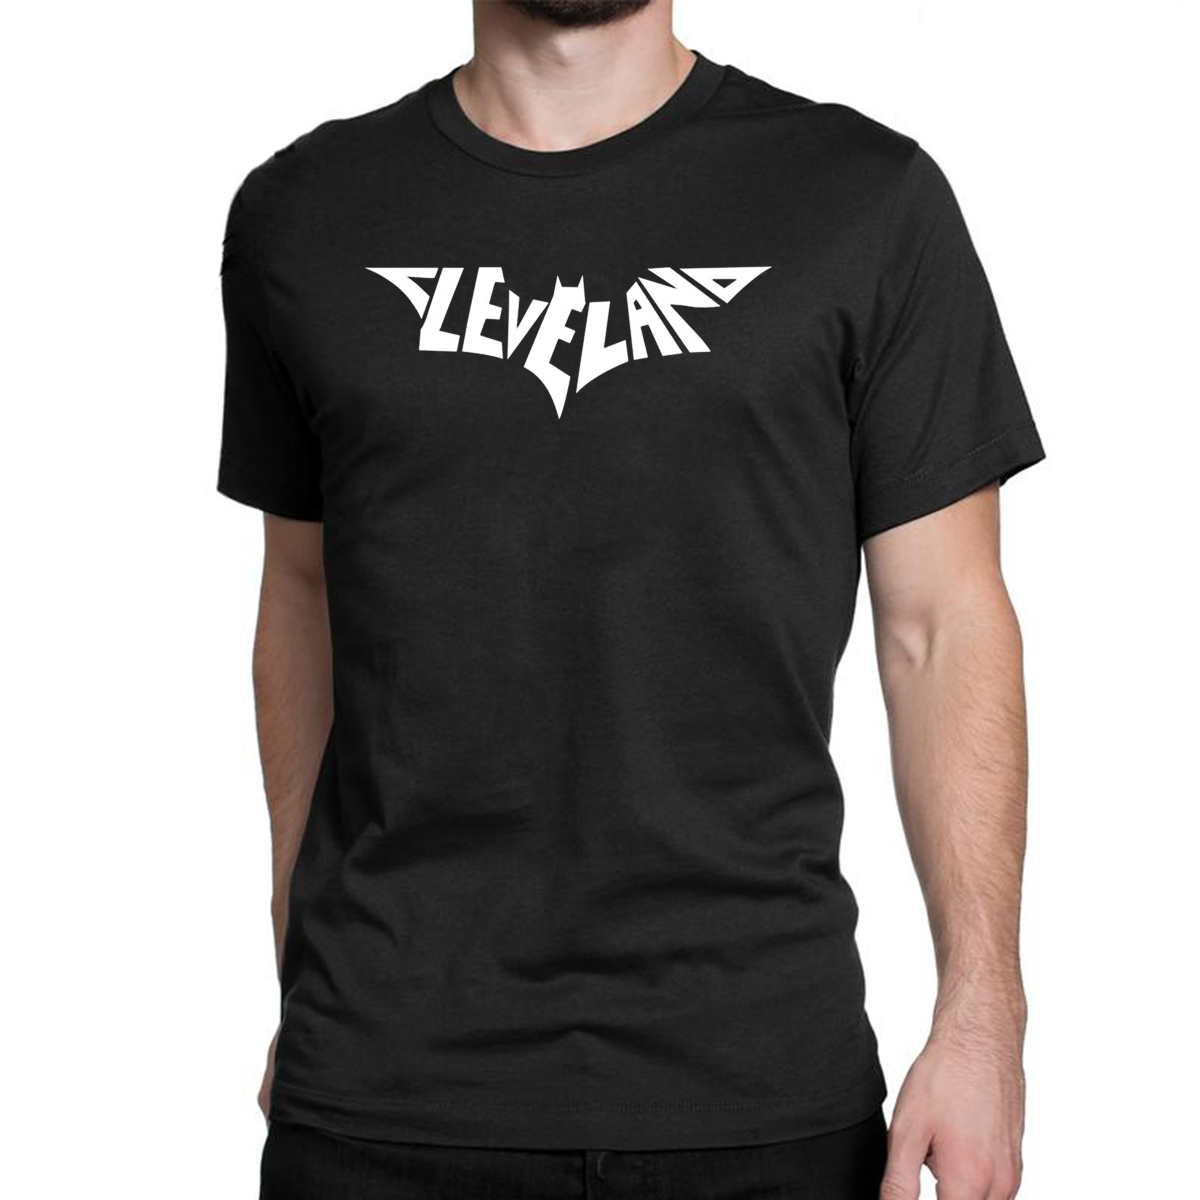 quality design e2ff3 602f6 Nick Chubb Batman Cleveland Classic Tee Shirt